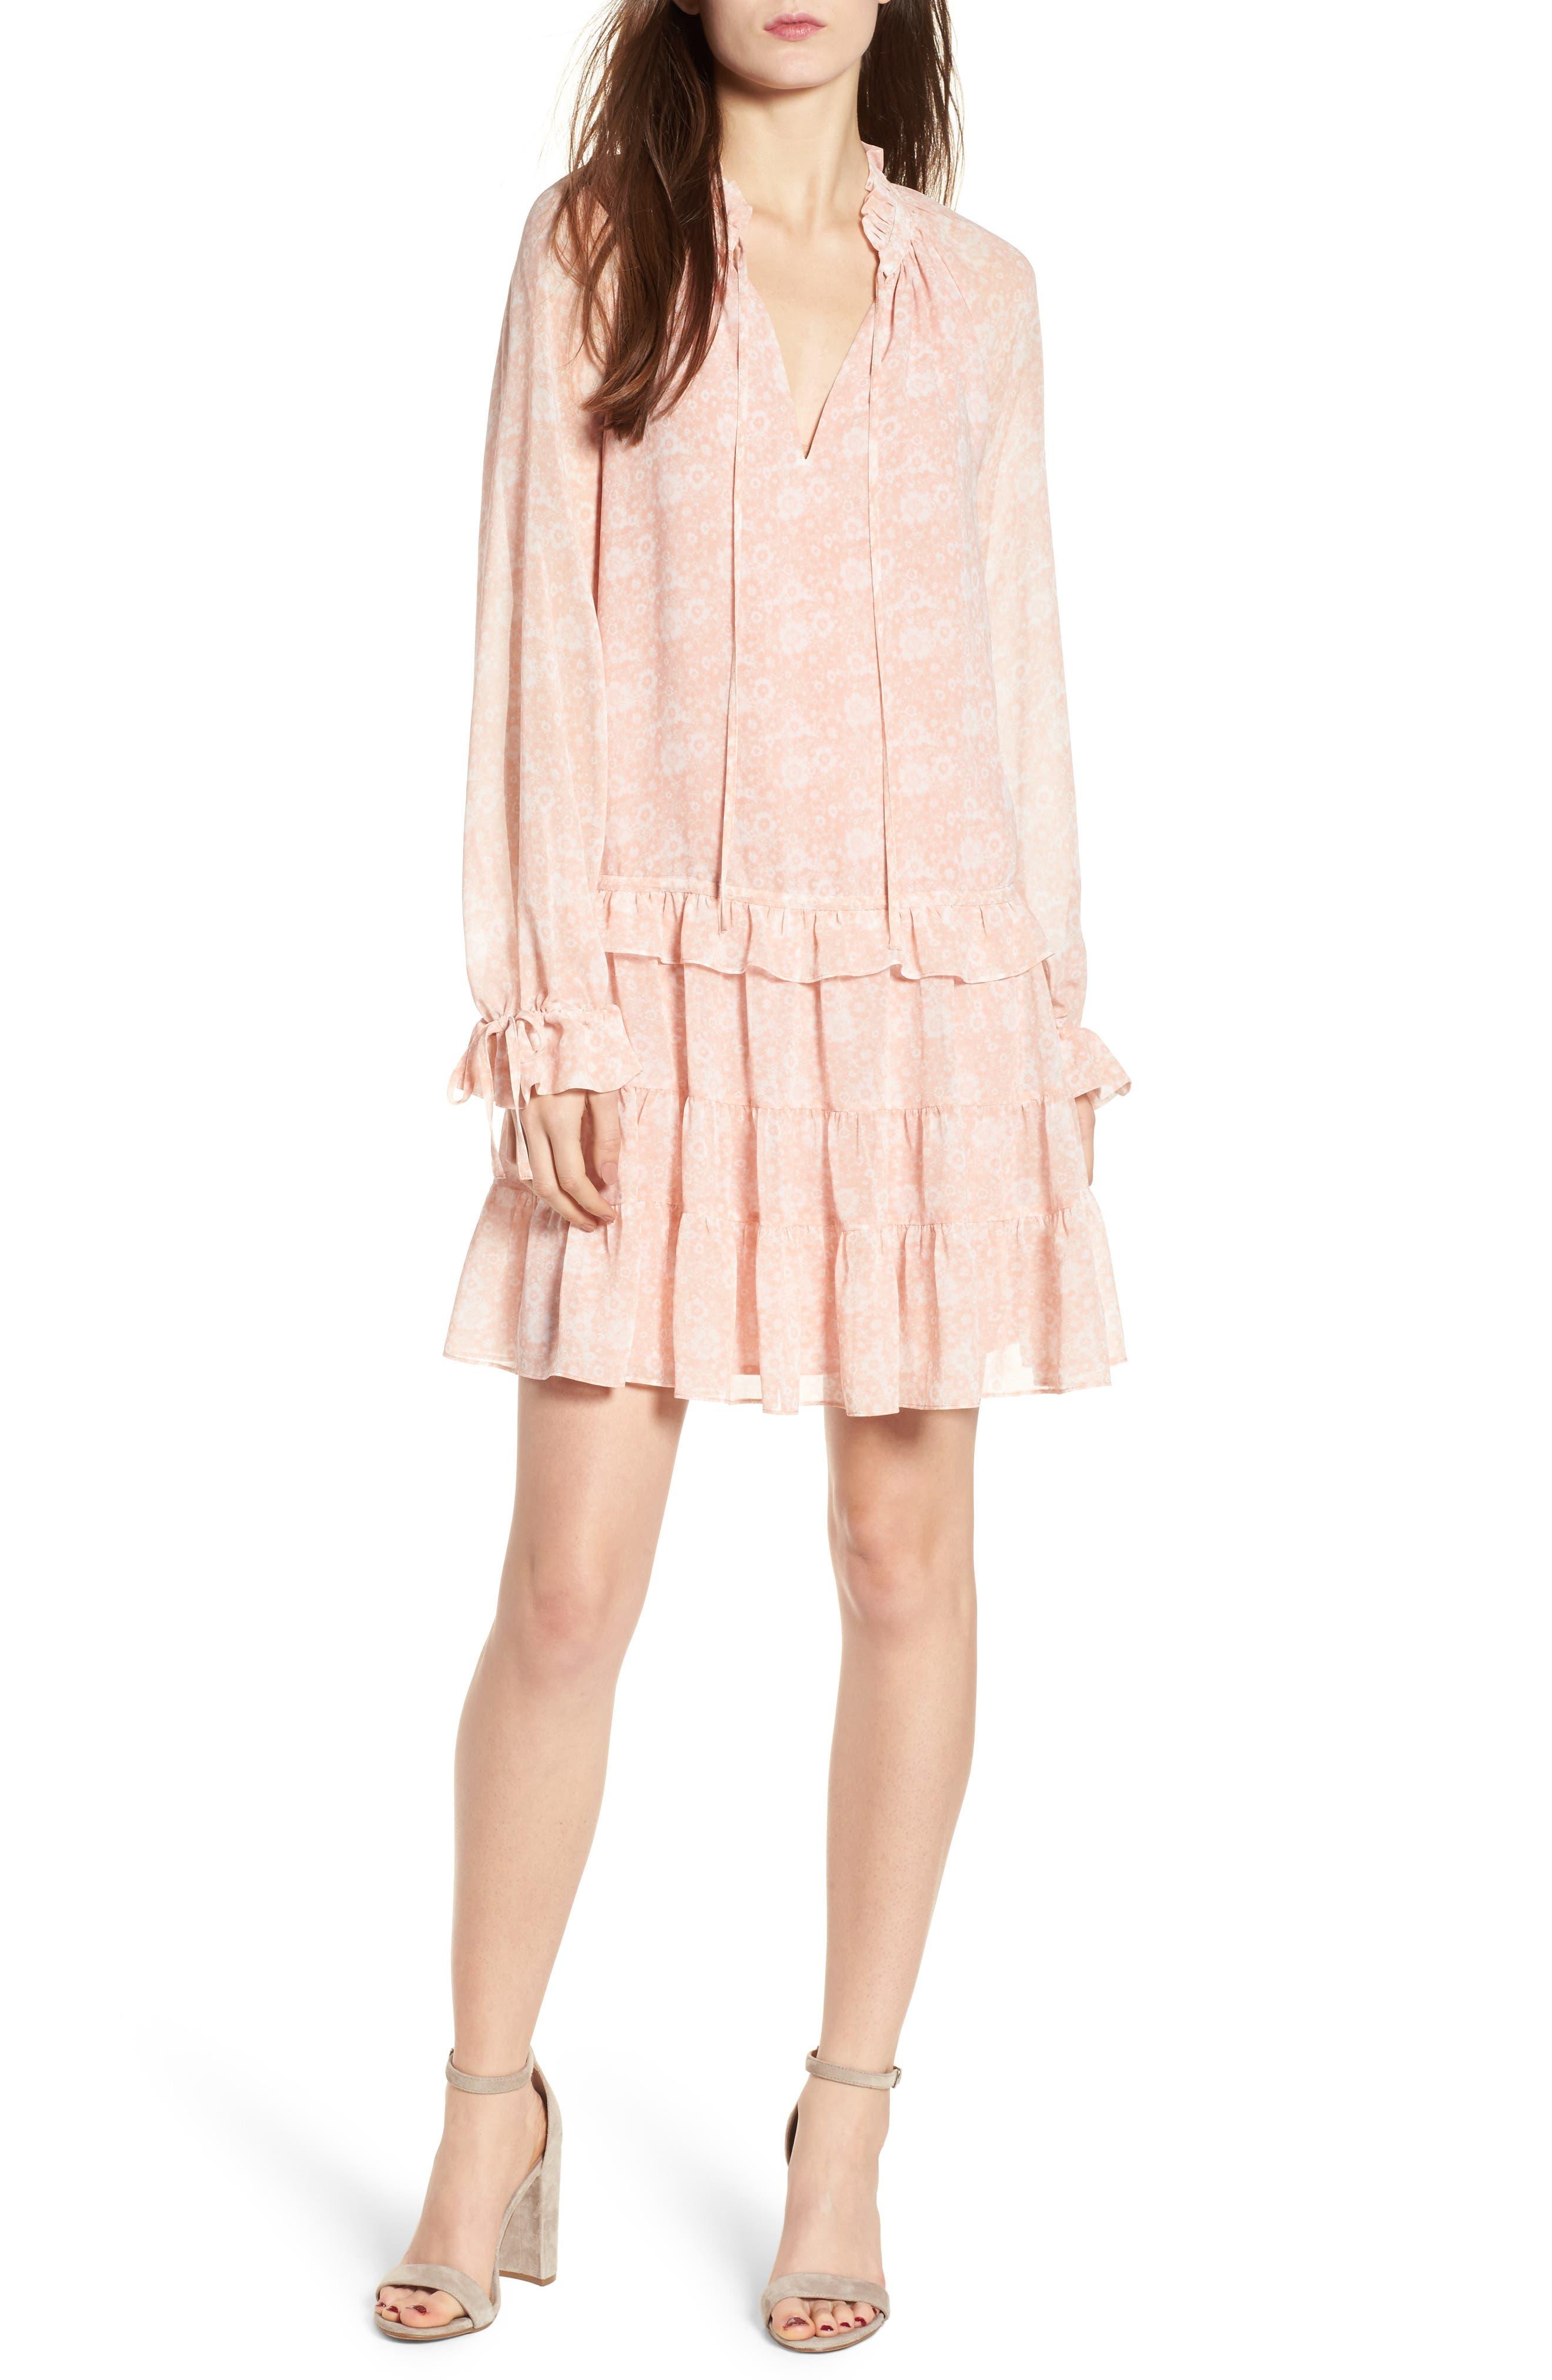 Dylan Drop Waist Dress,                             Main thumbnail 1, color,                             Light Pink Multi